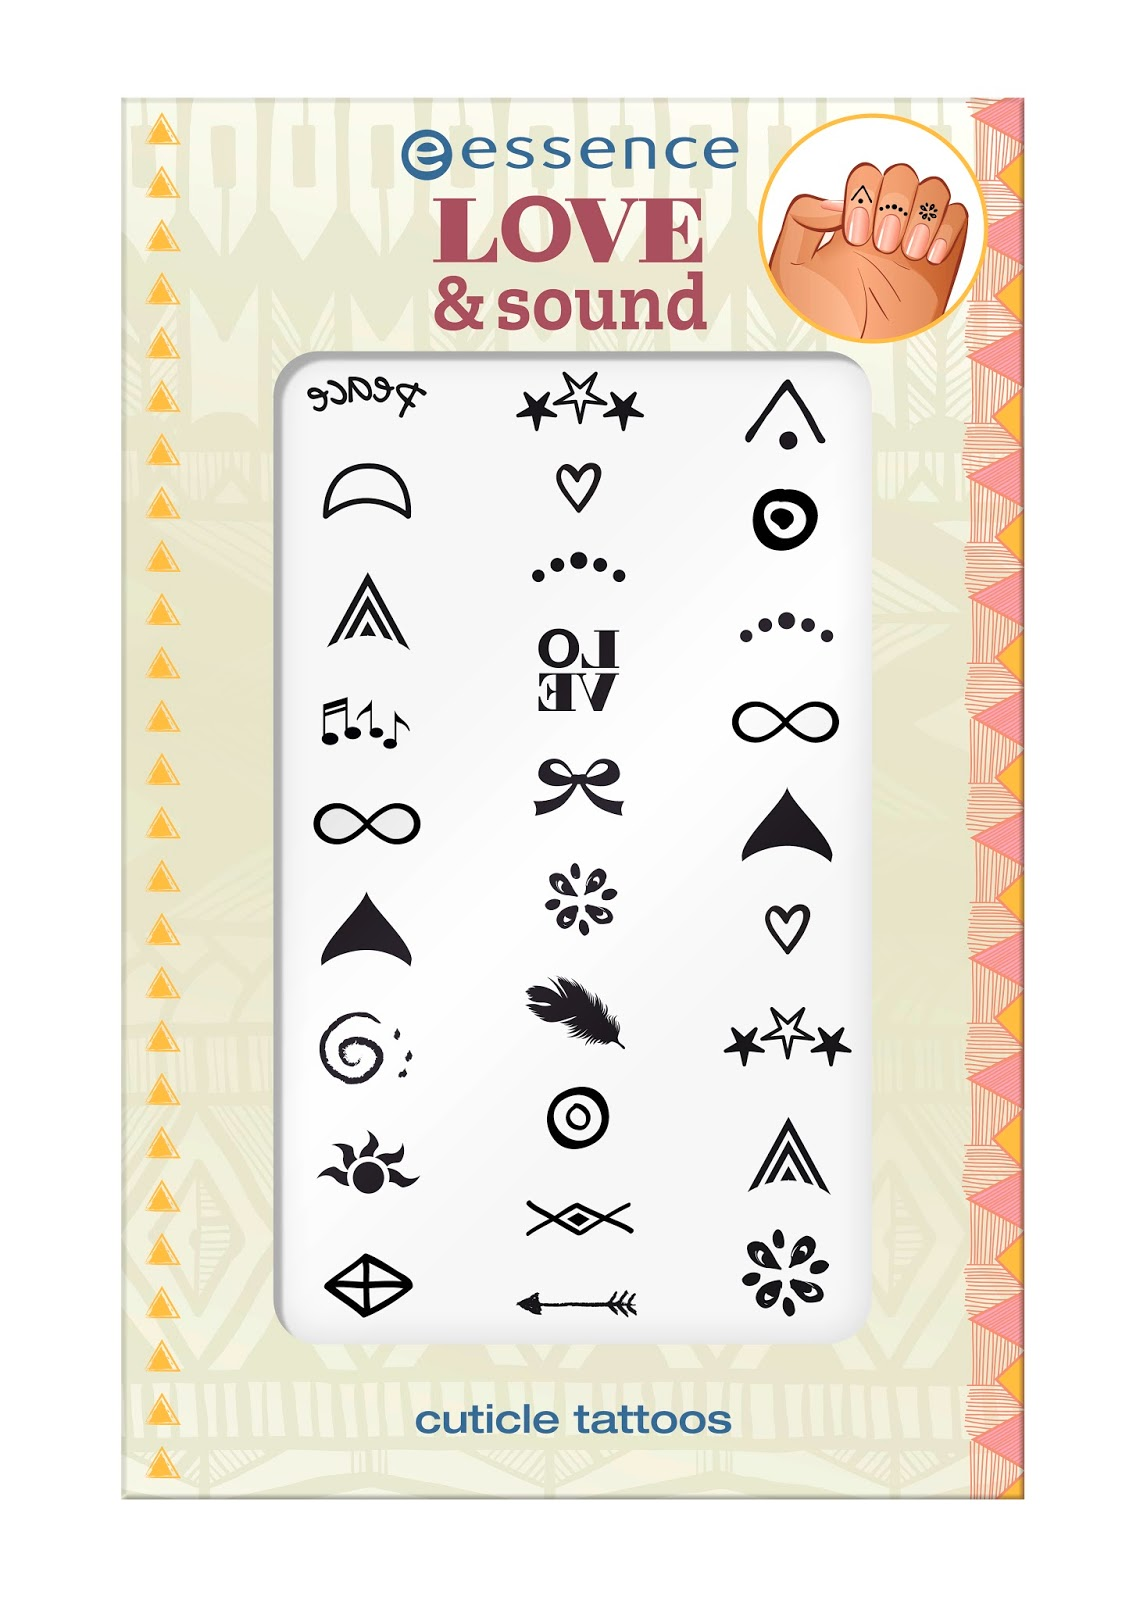 Essence limited edition Love & Sound